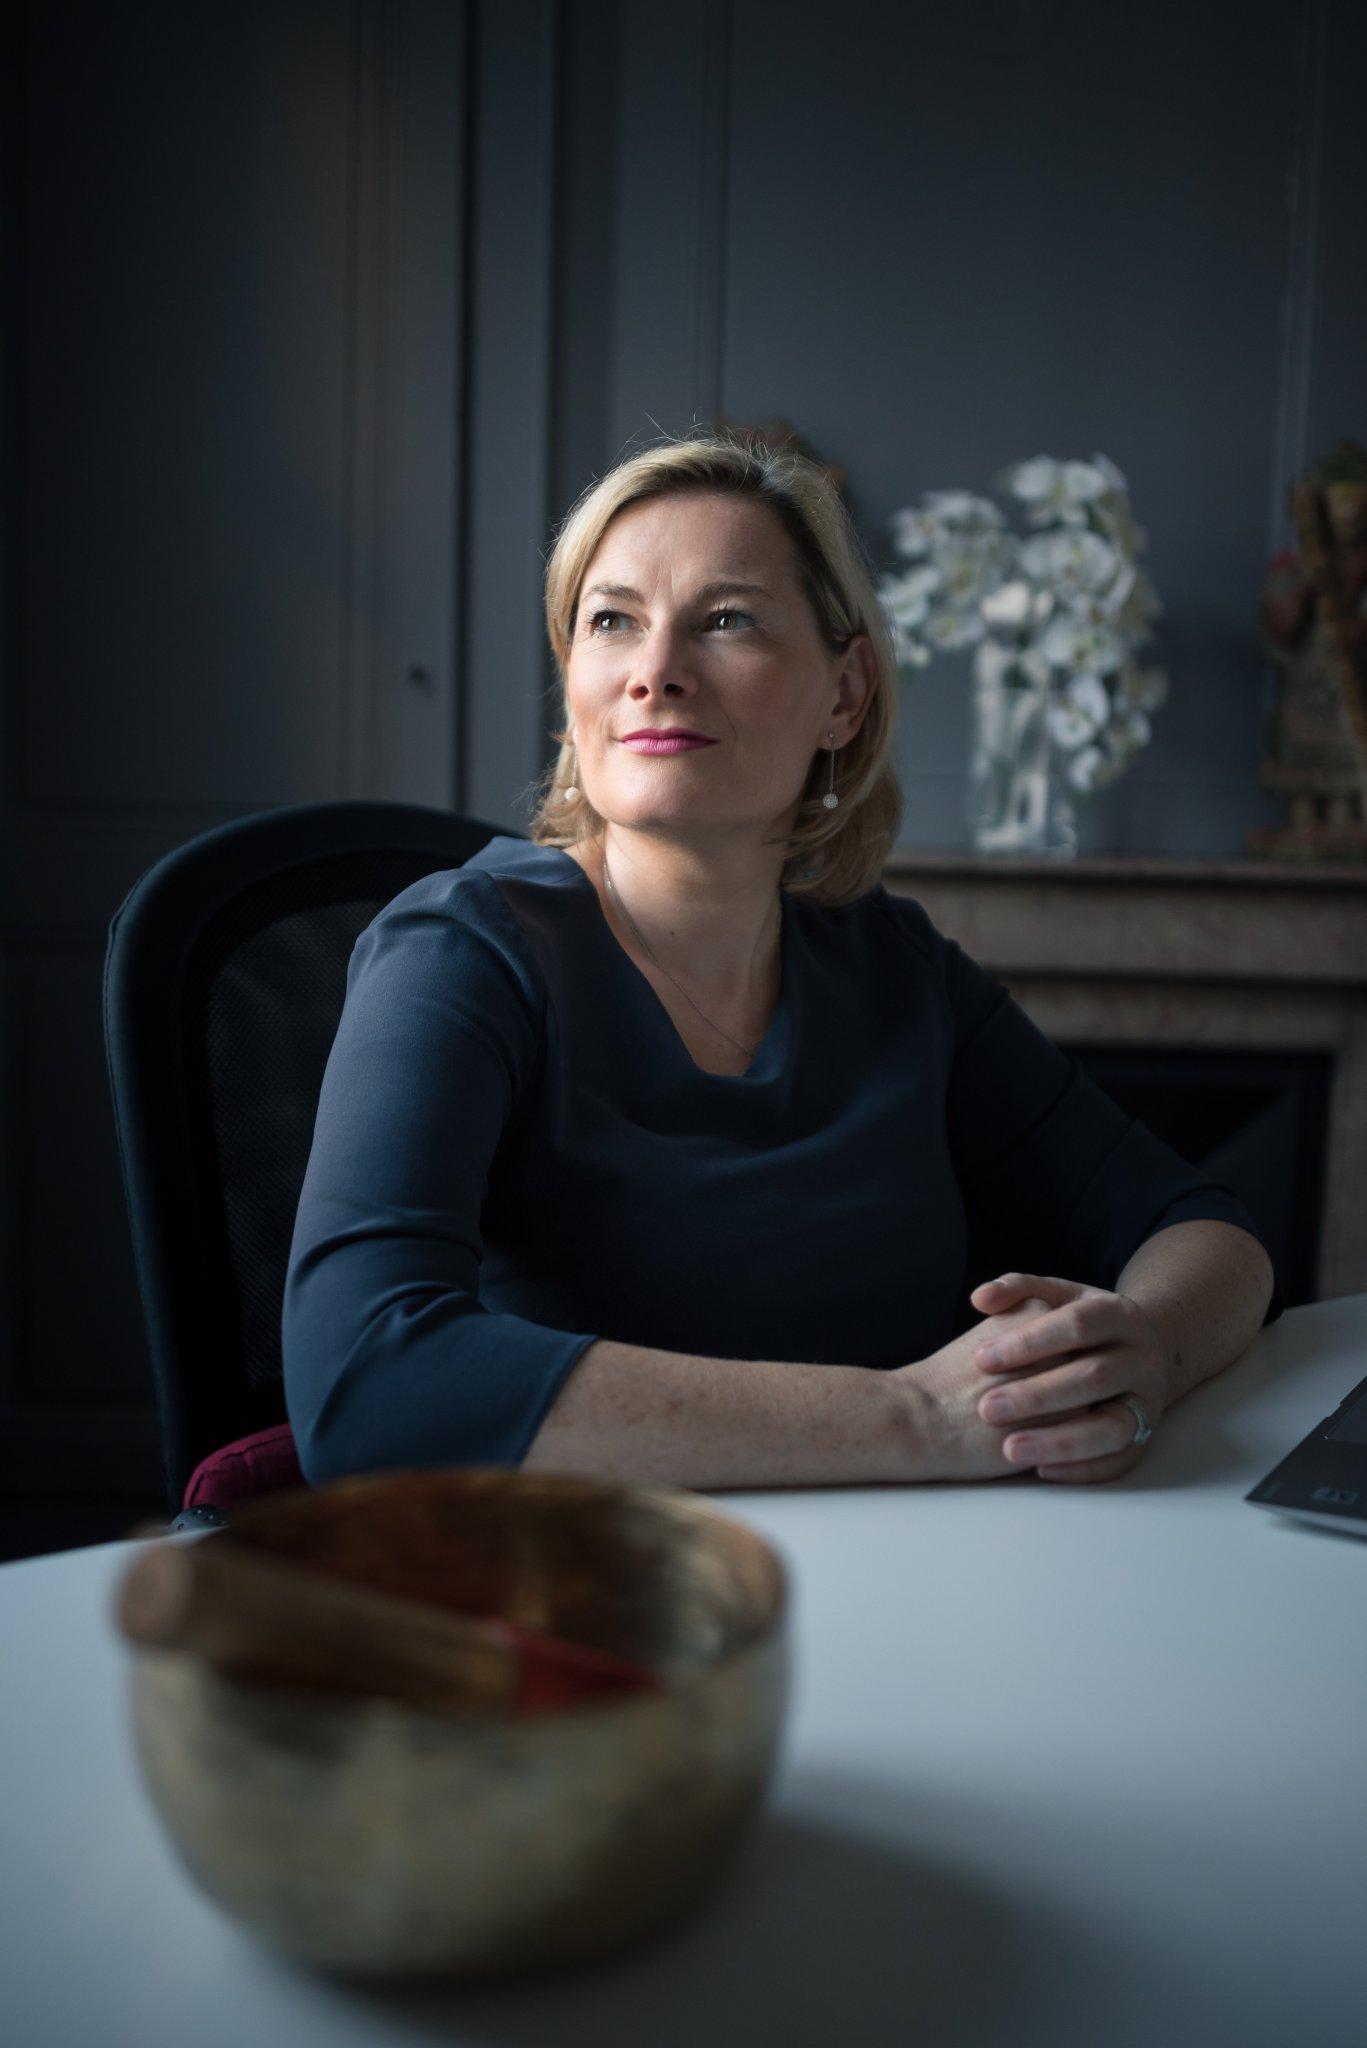 Photographe Lyon Villeurbanne - portrait entrepreneur gérant communication corporate - Sandrine Tolegano Jourdren